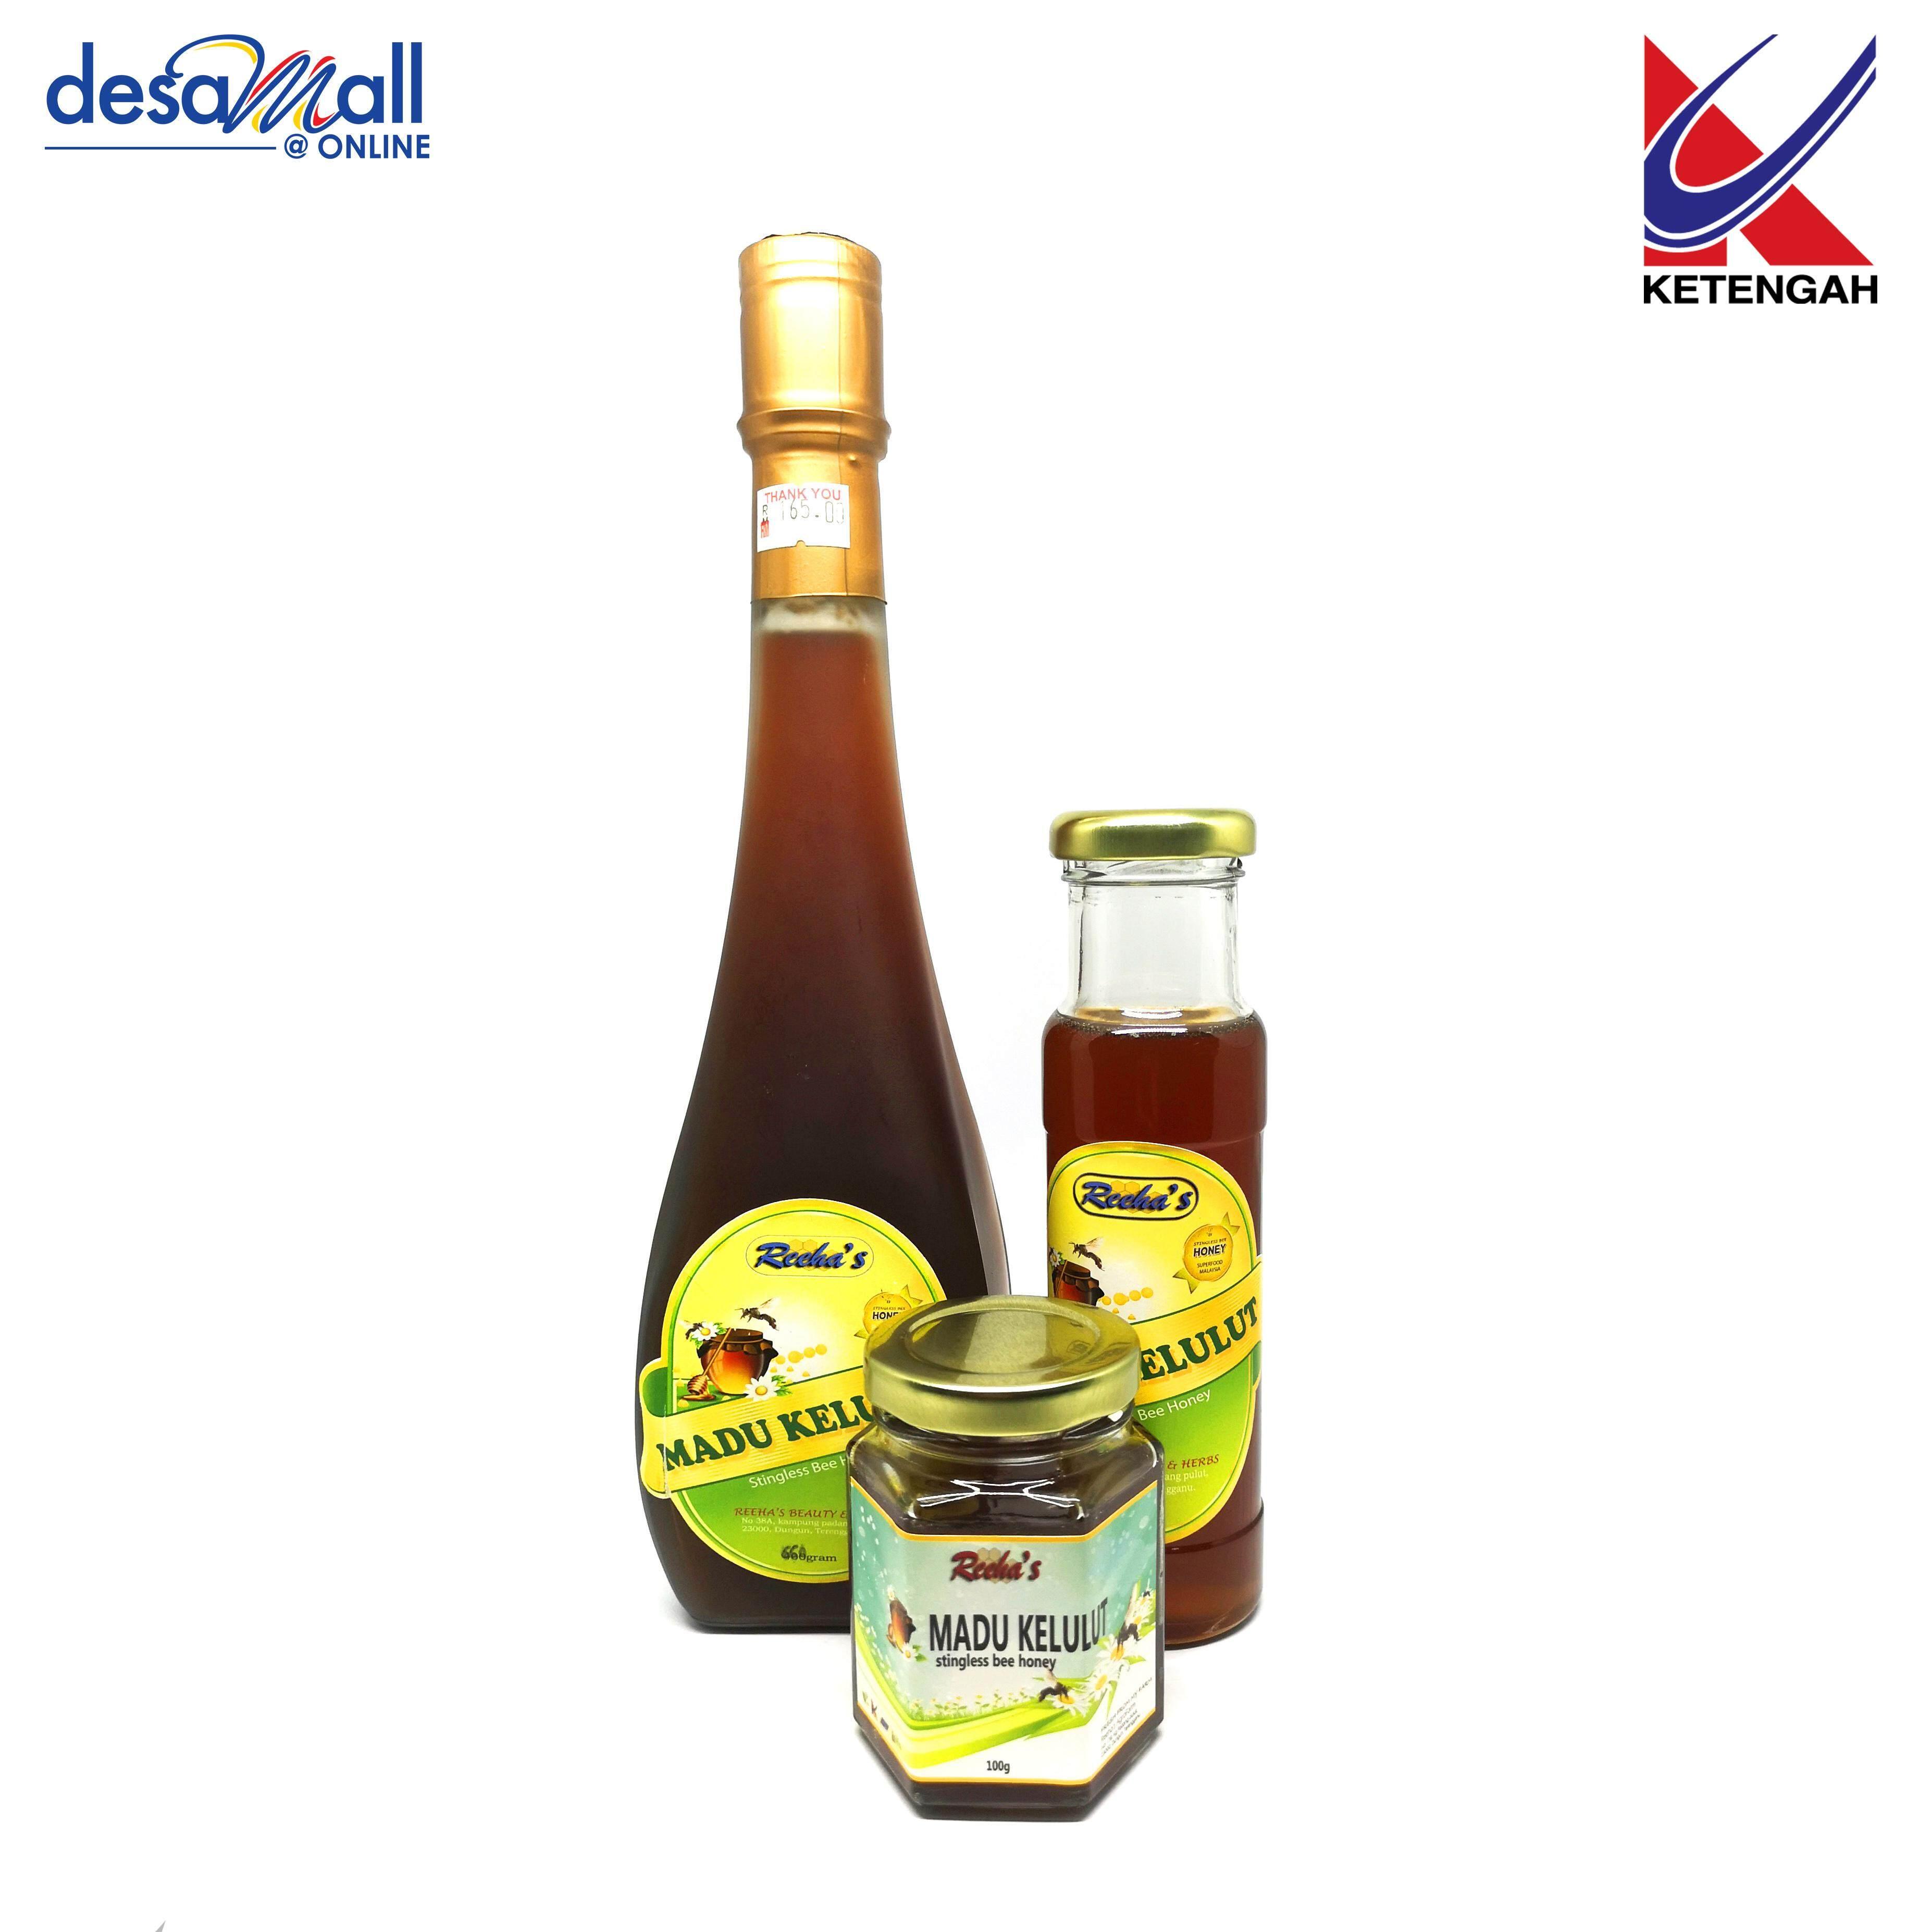 Combo Reeha\'s Madu Kelulut Stingless Bee Honey RTD Kualiti Premium (100g,200g, 500g)